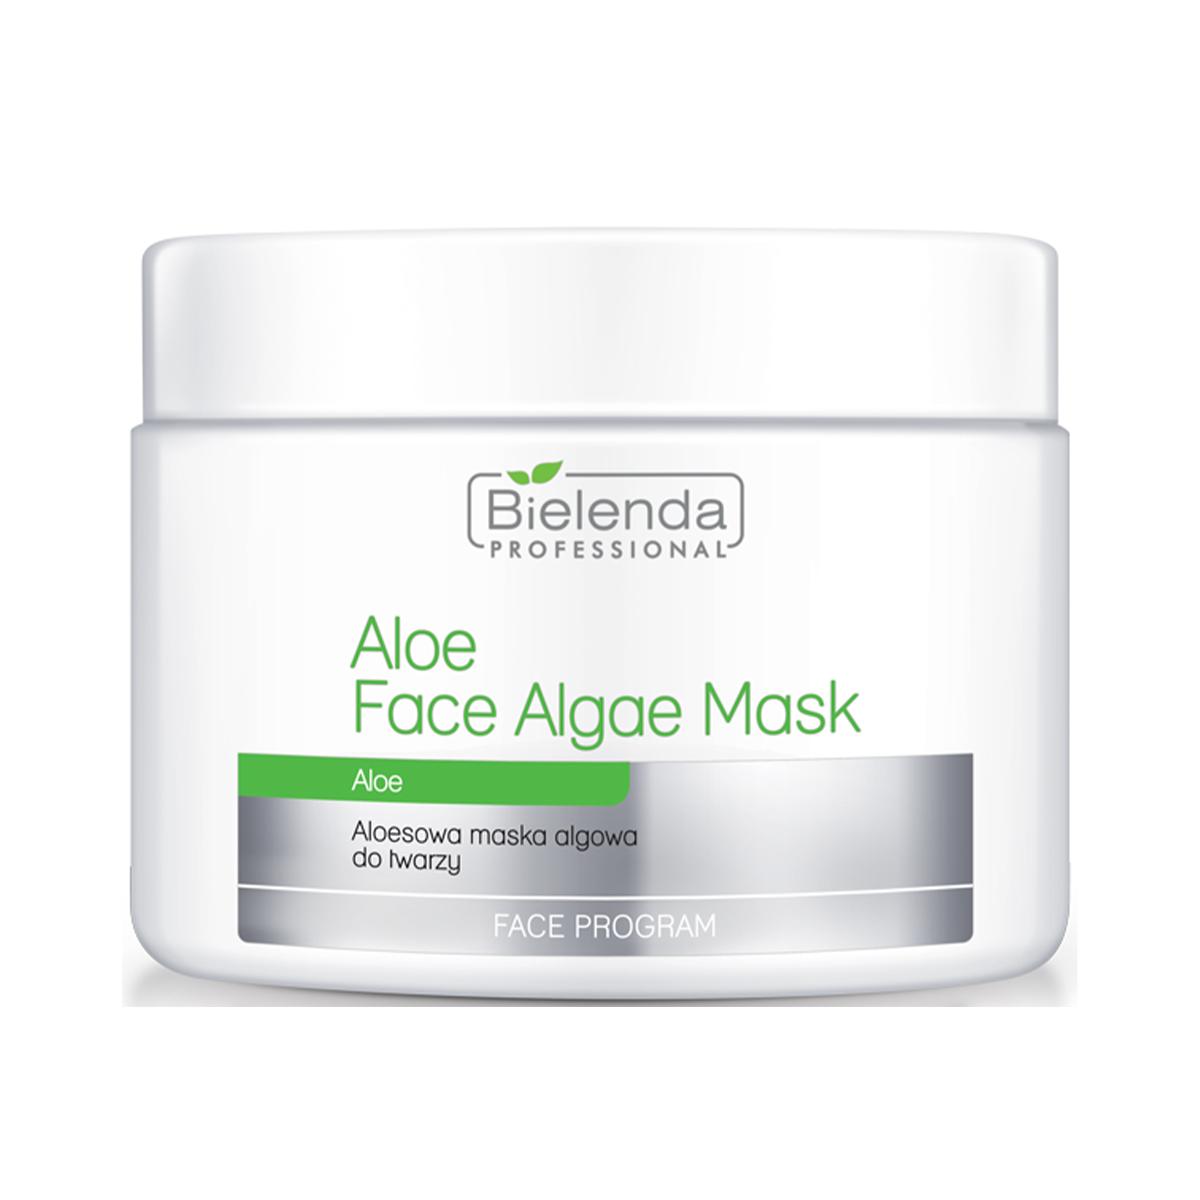 Algae mask Альгинатная маска для лица Алоэ, 190 г.